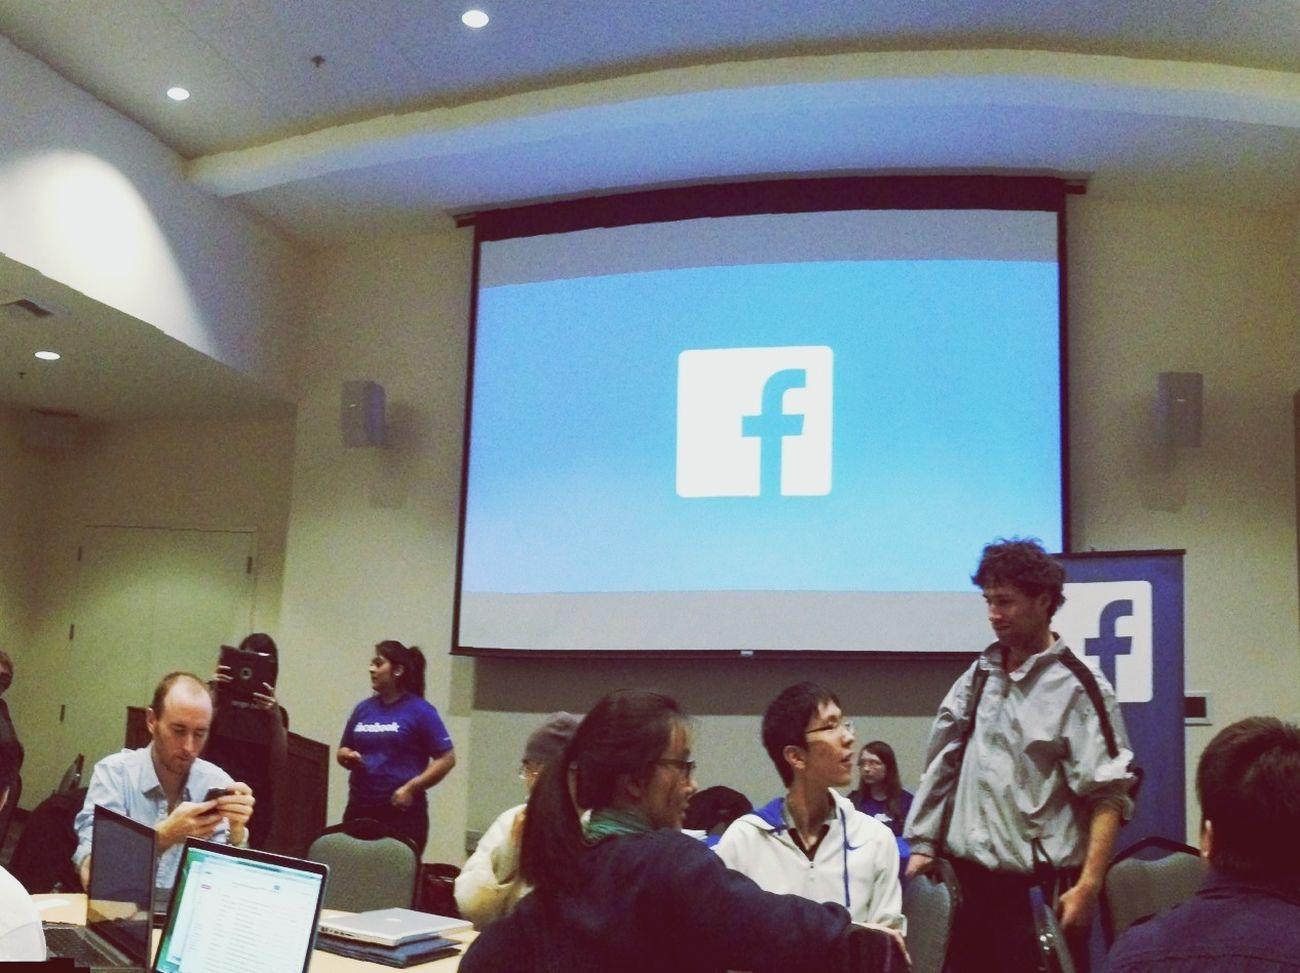 Facebook event last night at Ucdavis